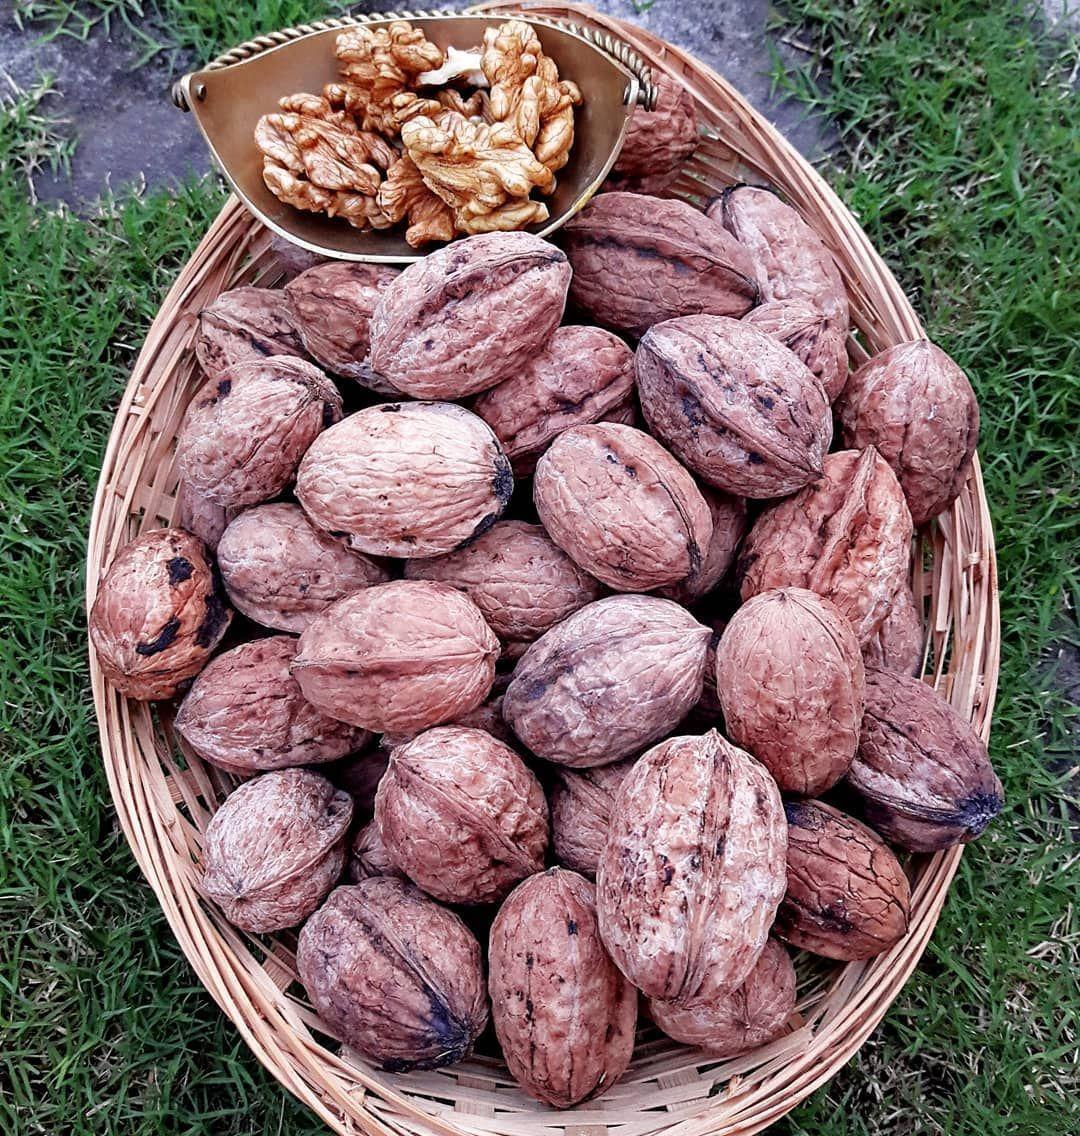 Homegrown Walnuts .... #foodphoto #food #nuts #walnuts #abbottabad #home #pakistan #organic #omega3 #nutrition #instagram #photography #instaphoto #foodphotography #cozy #healthyeating #fallinlove #healthyfood #health #healthylifestyle #ketolife #organicfood #walnutsnutrition Homegrown Walnuts .... #foodphoto #food #nuts #walnuts #abbottabad #home #pakistan #organic #omega3 #nutrition #instagram #photography #instaphoto #foodphotography #cozy #healthyeating #fallinlove #healthyfood #health #heal #walnutsnutrition